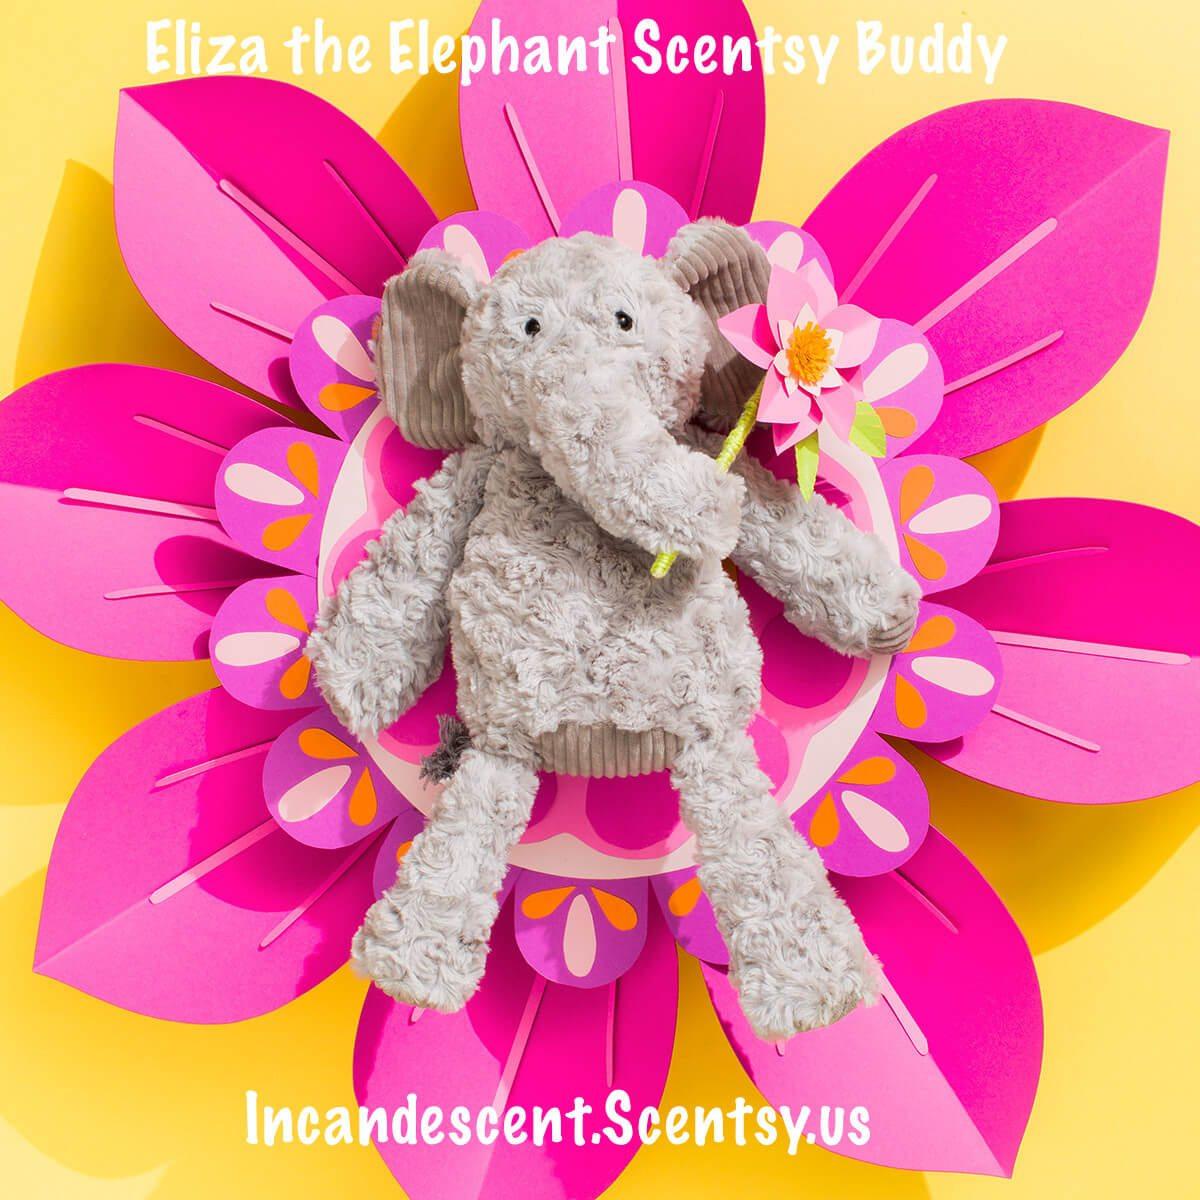 ELIZA THE ELEPHANT SCENTSY BUDDY | New Scentsy Buddy Arriving October 10, 2017 - Eliza the Elephant!